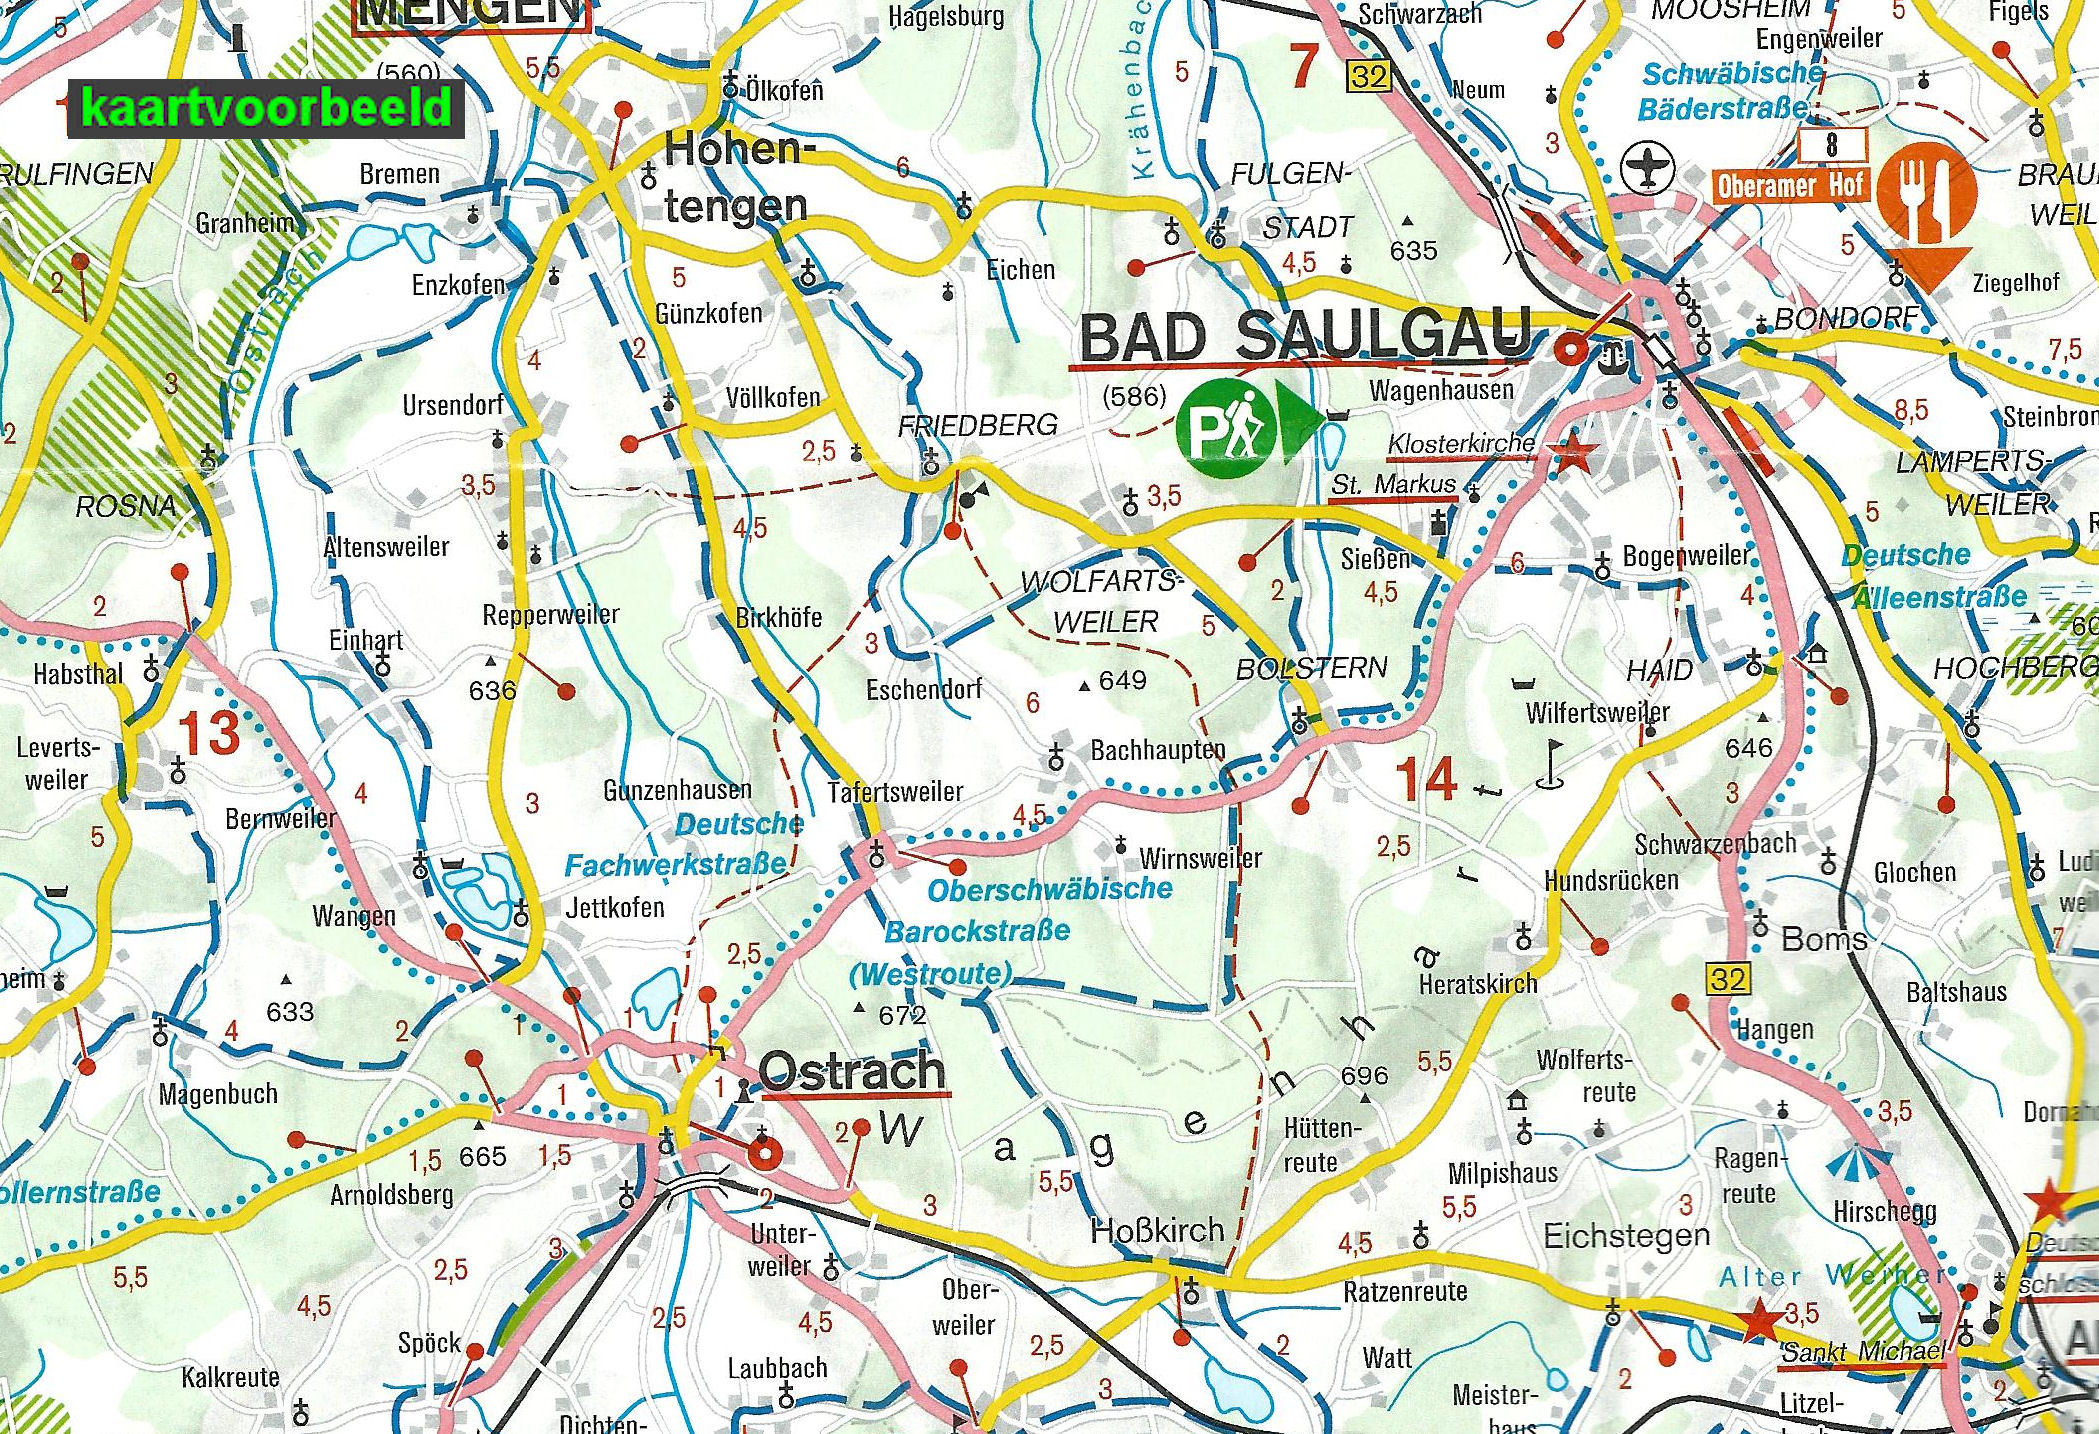 Wegenkaart Landkaart 43 Freizeitkarte Munchen Und Umgebung